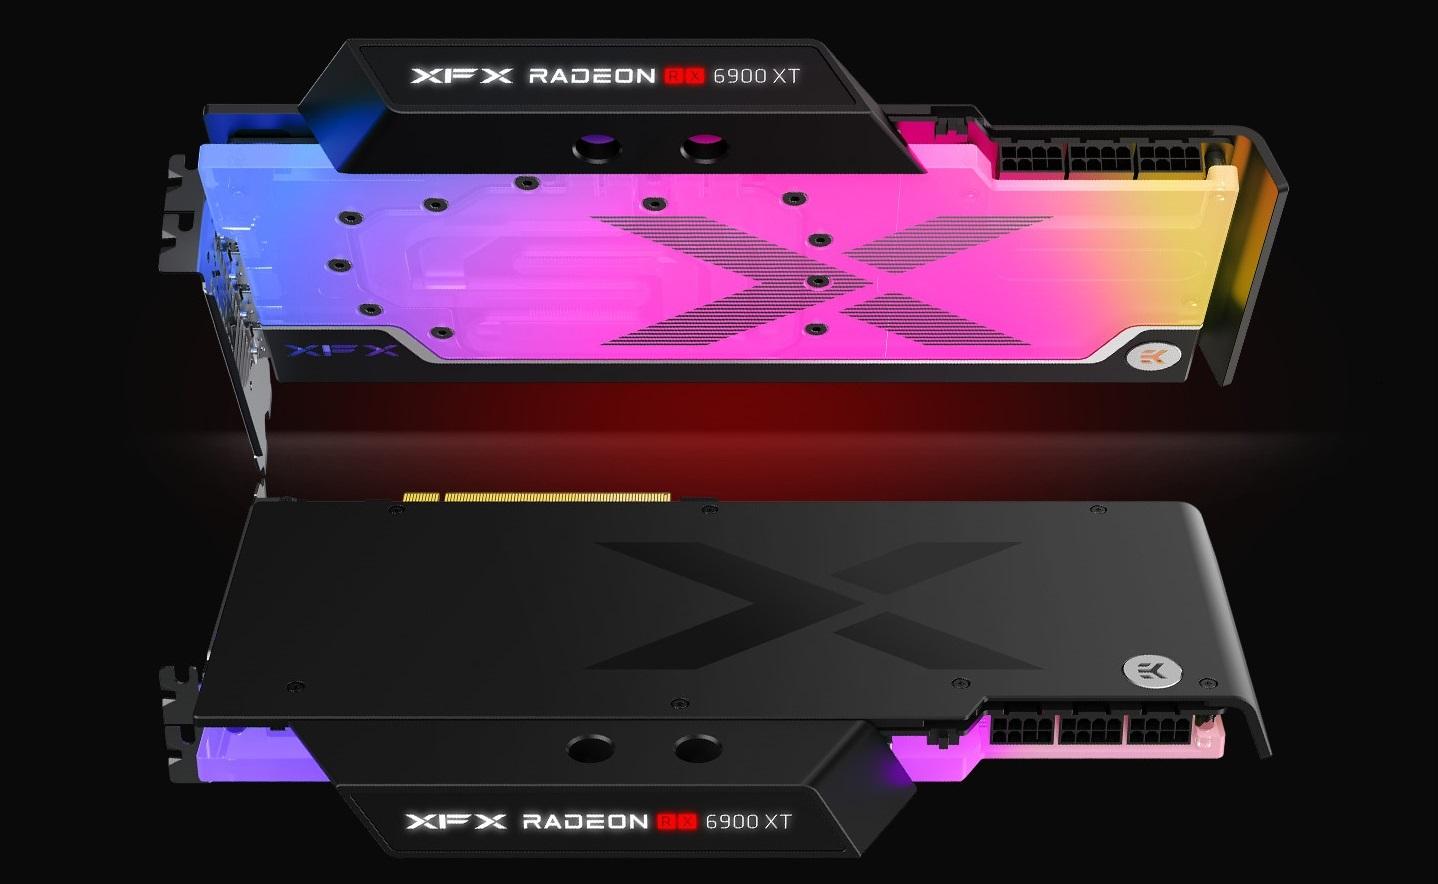 xfx-radeon-rx-6900-xt-zero-wb-graphics-card-3-ghz-oc-feature-_2